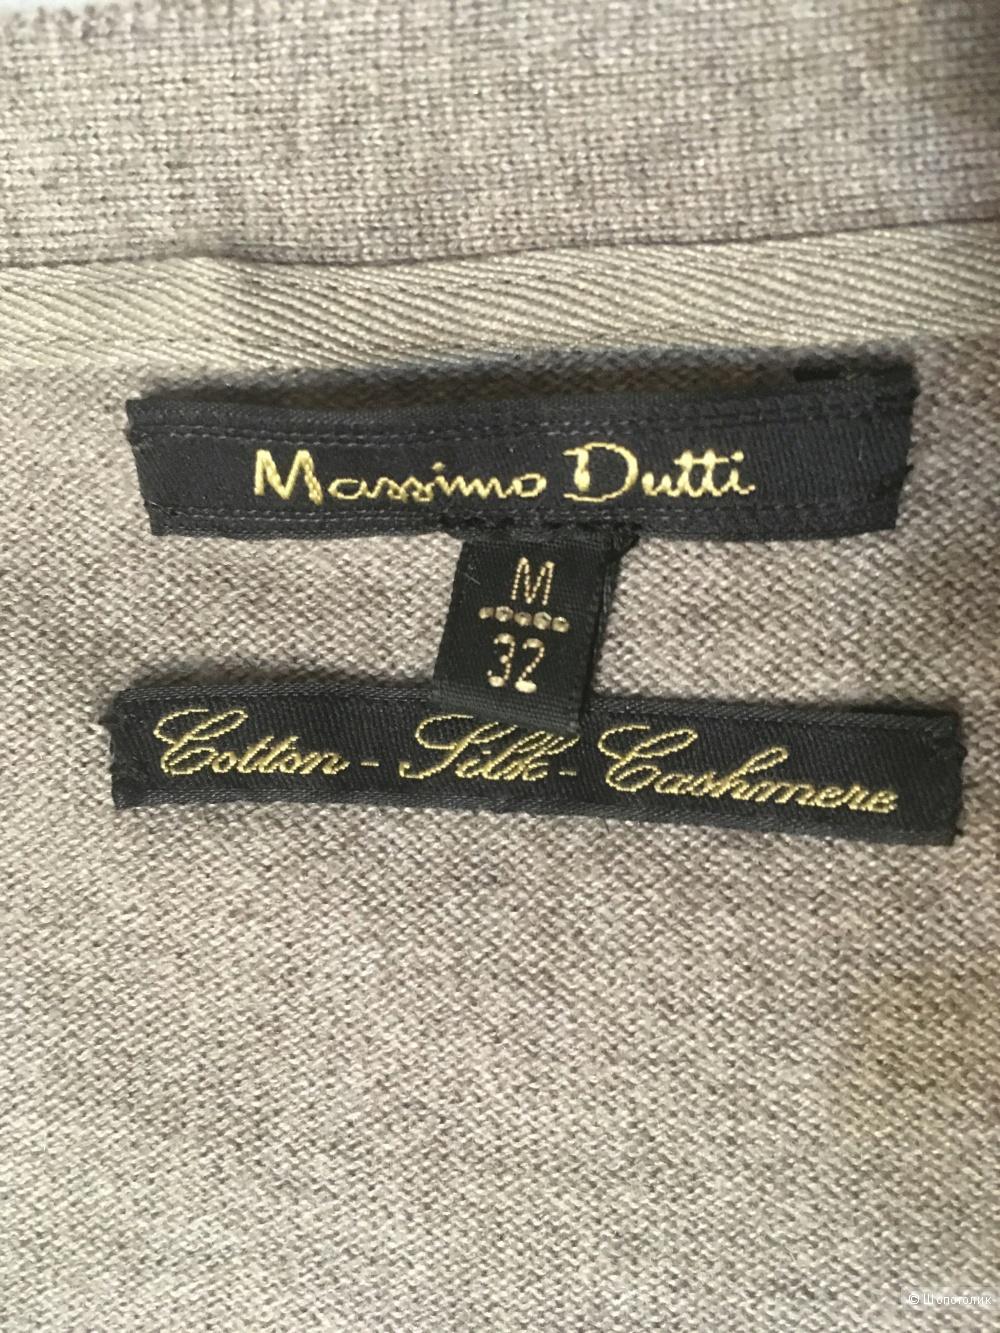 Кардиган Massimo Dutti. Размер 44-46.